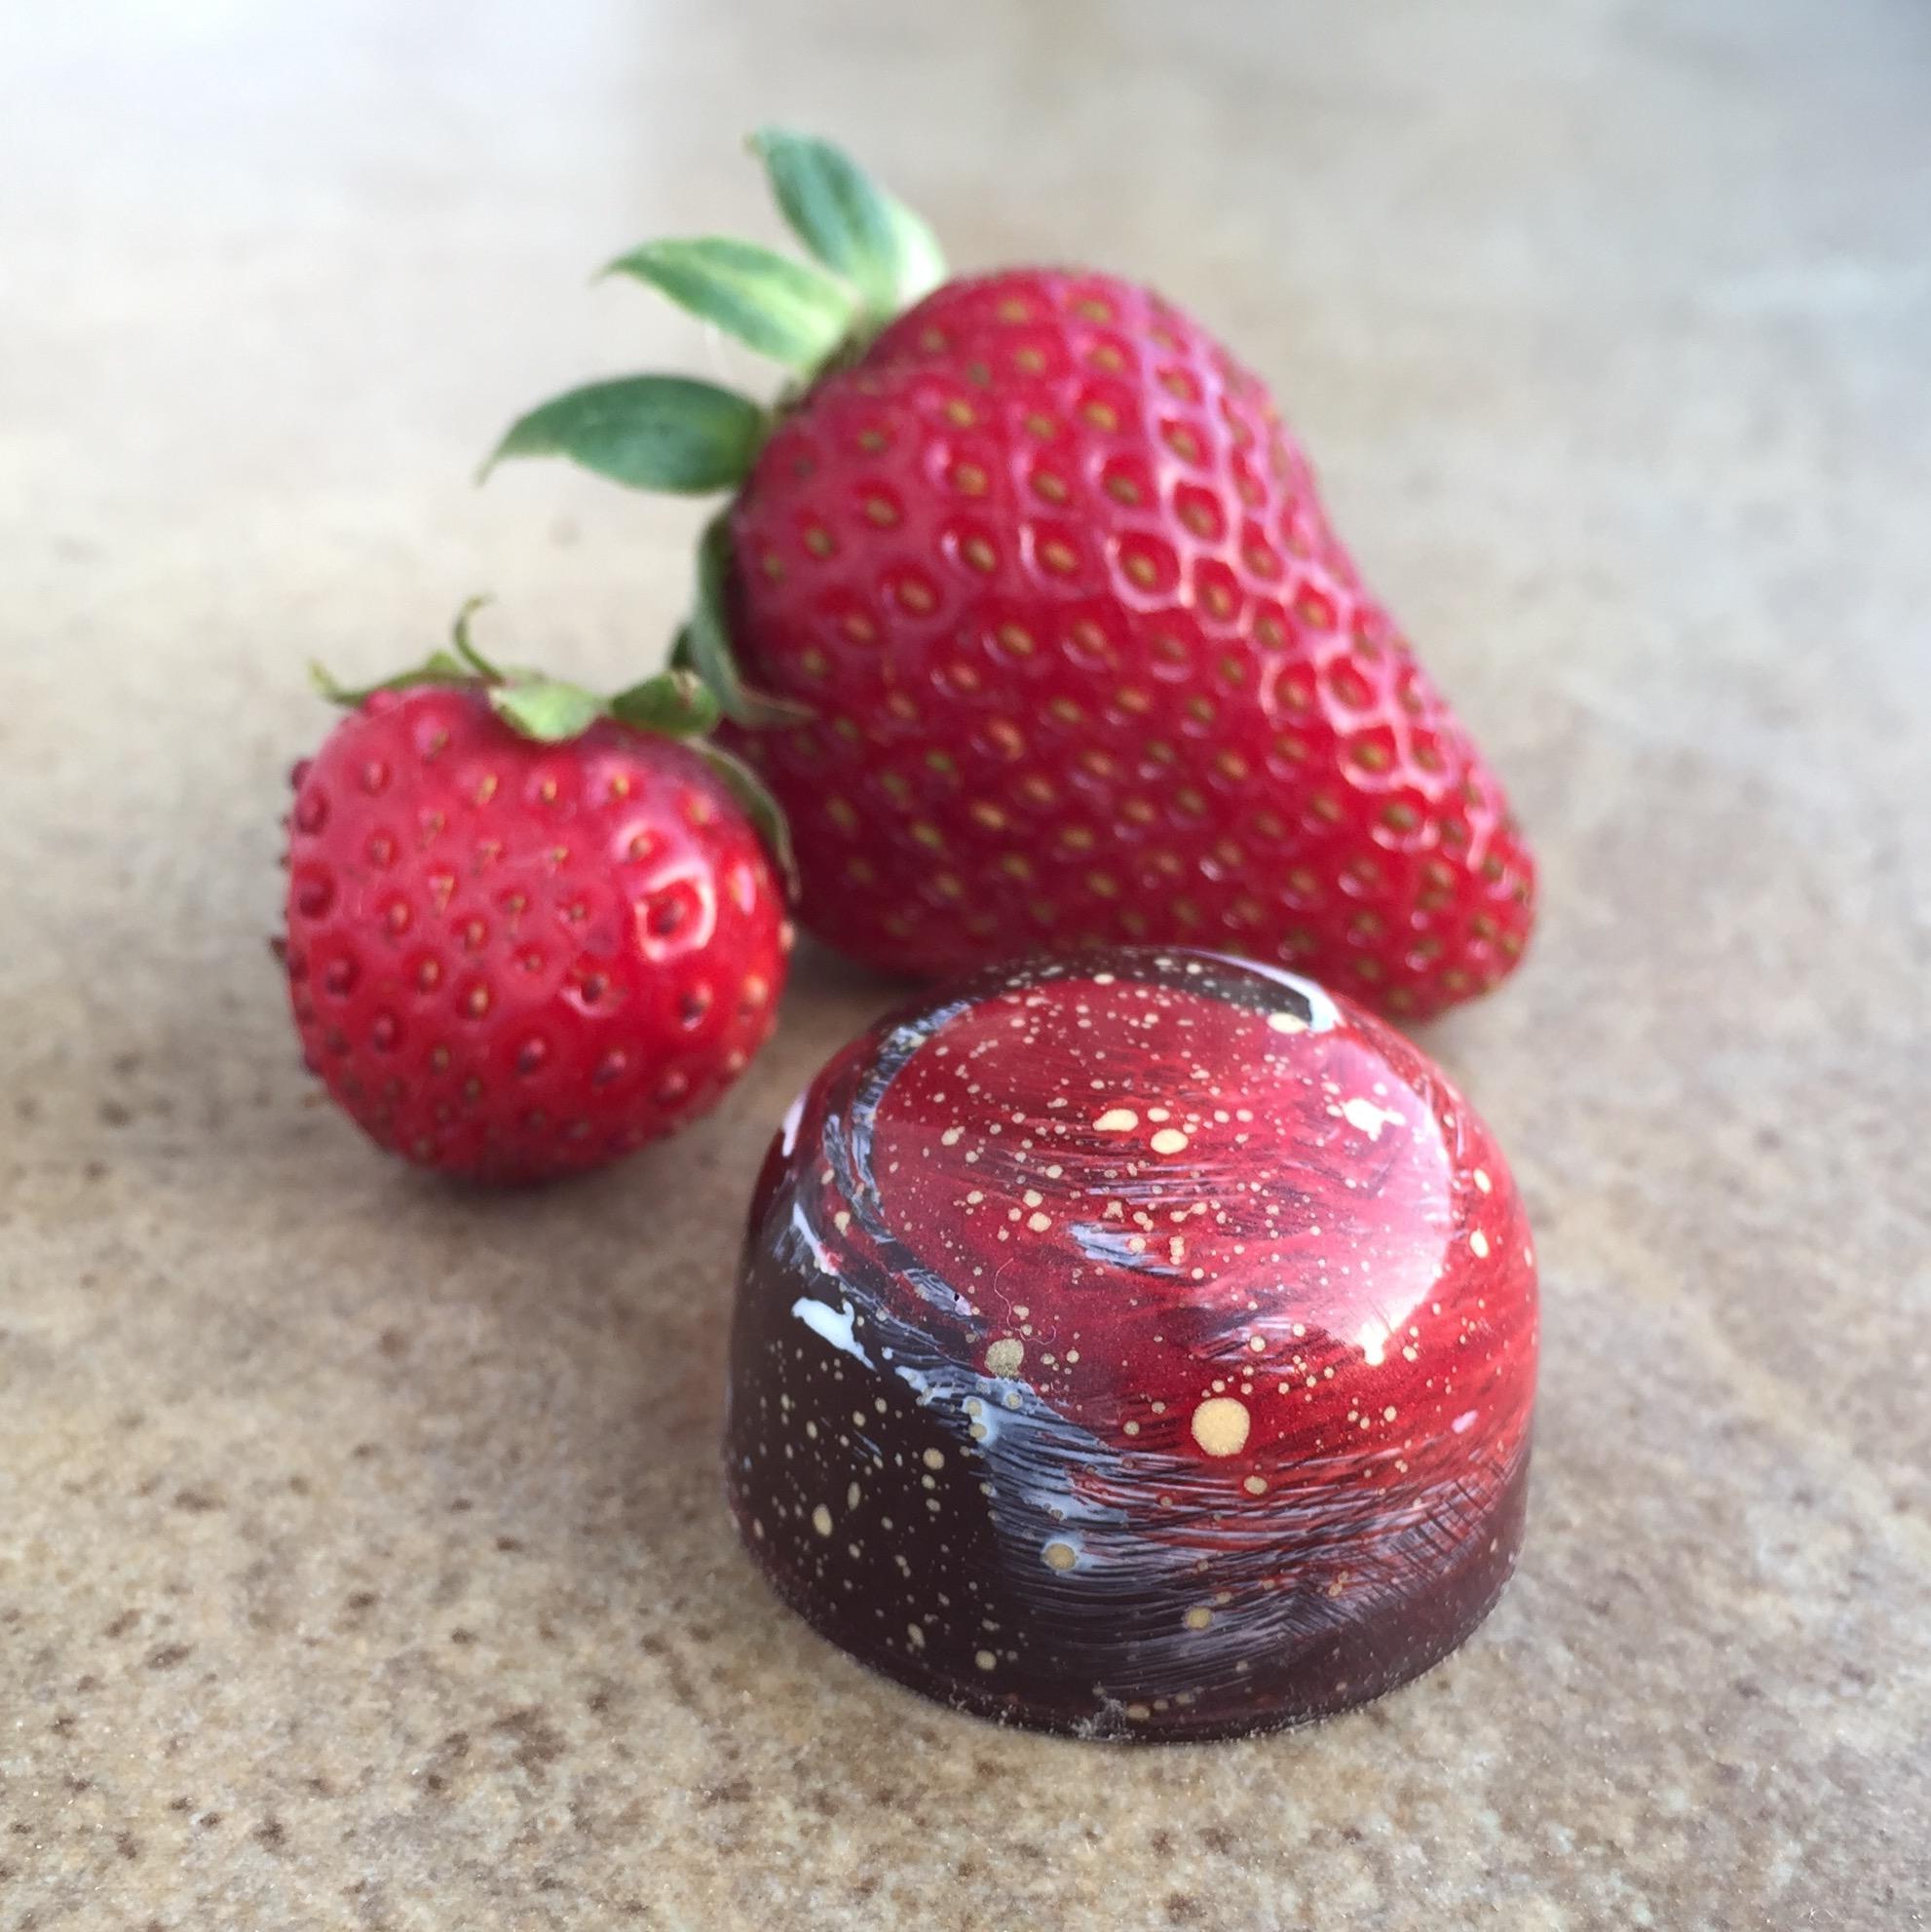 strawberry cadence chocolates.jpg